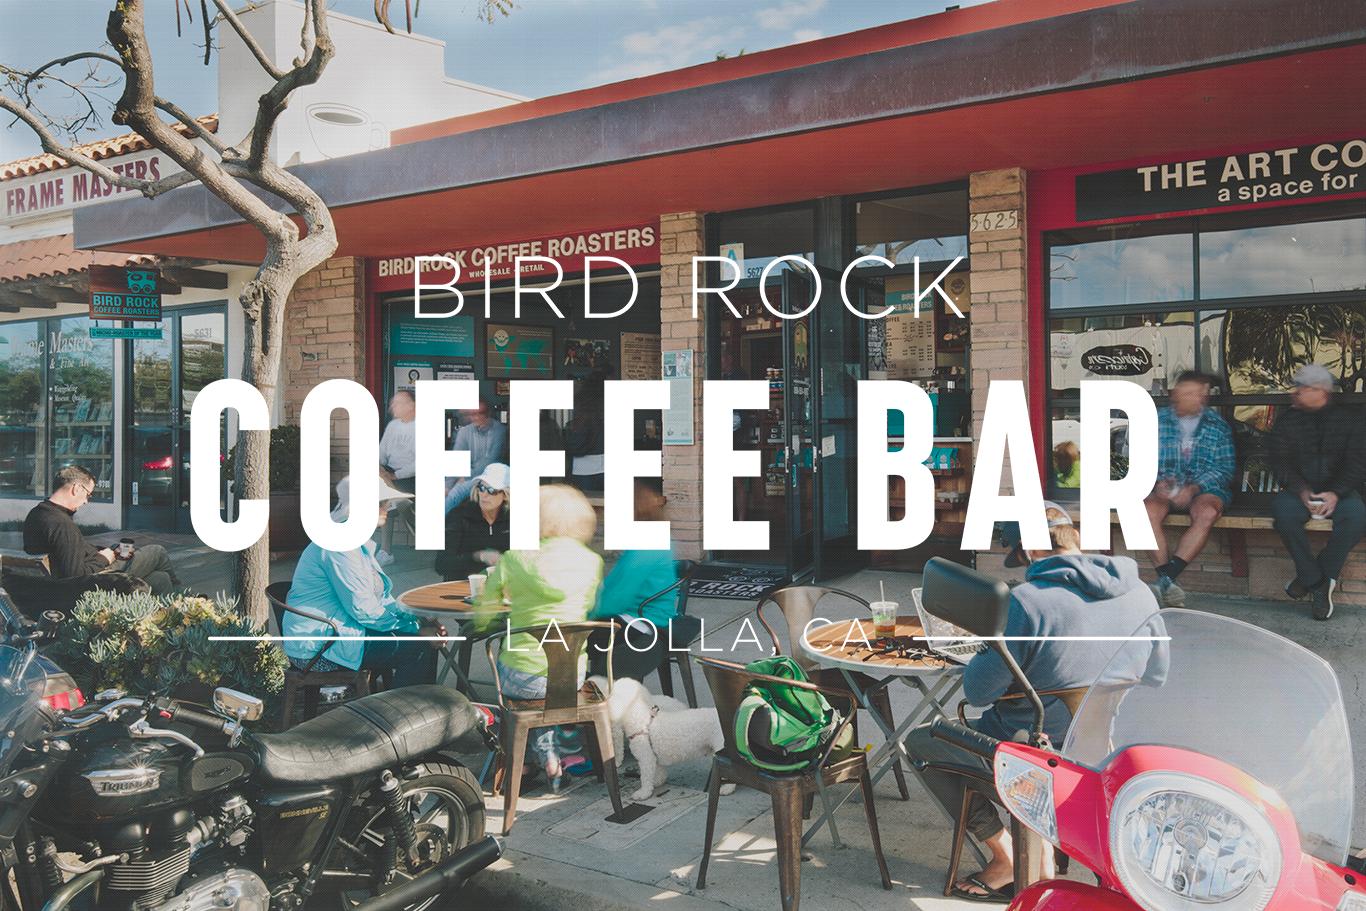 LA JOLLA COFFEE BAR - Bird Rock Coffee